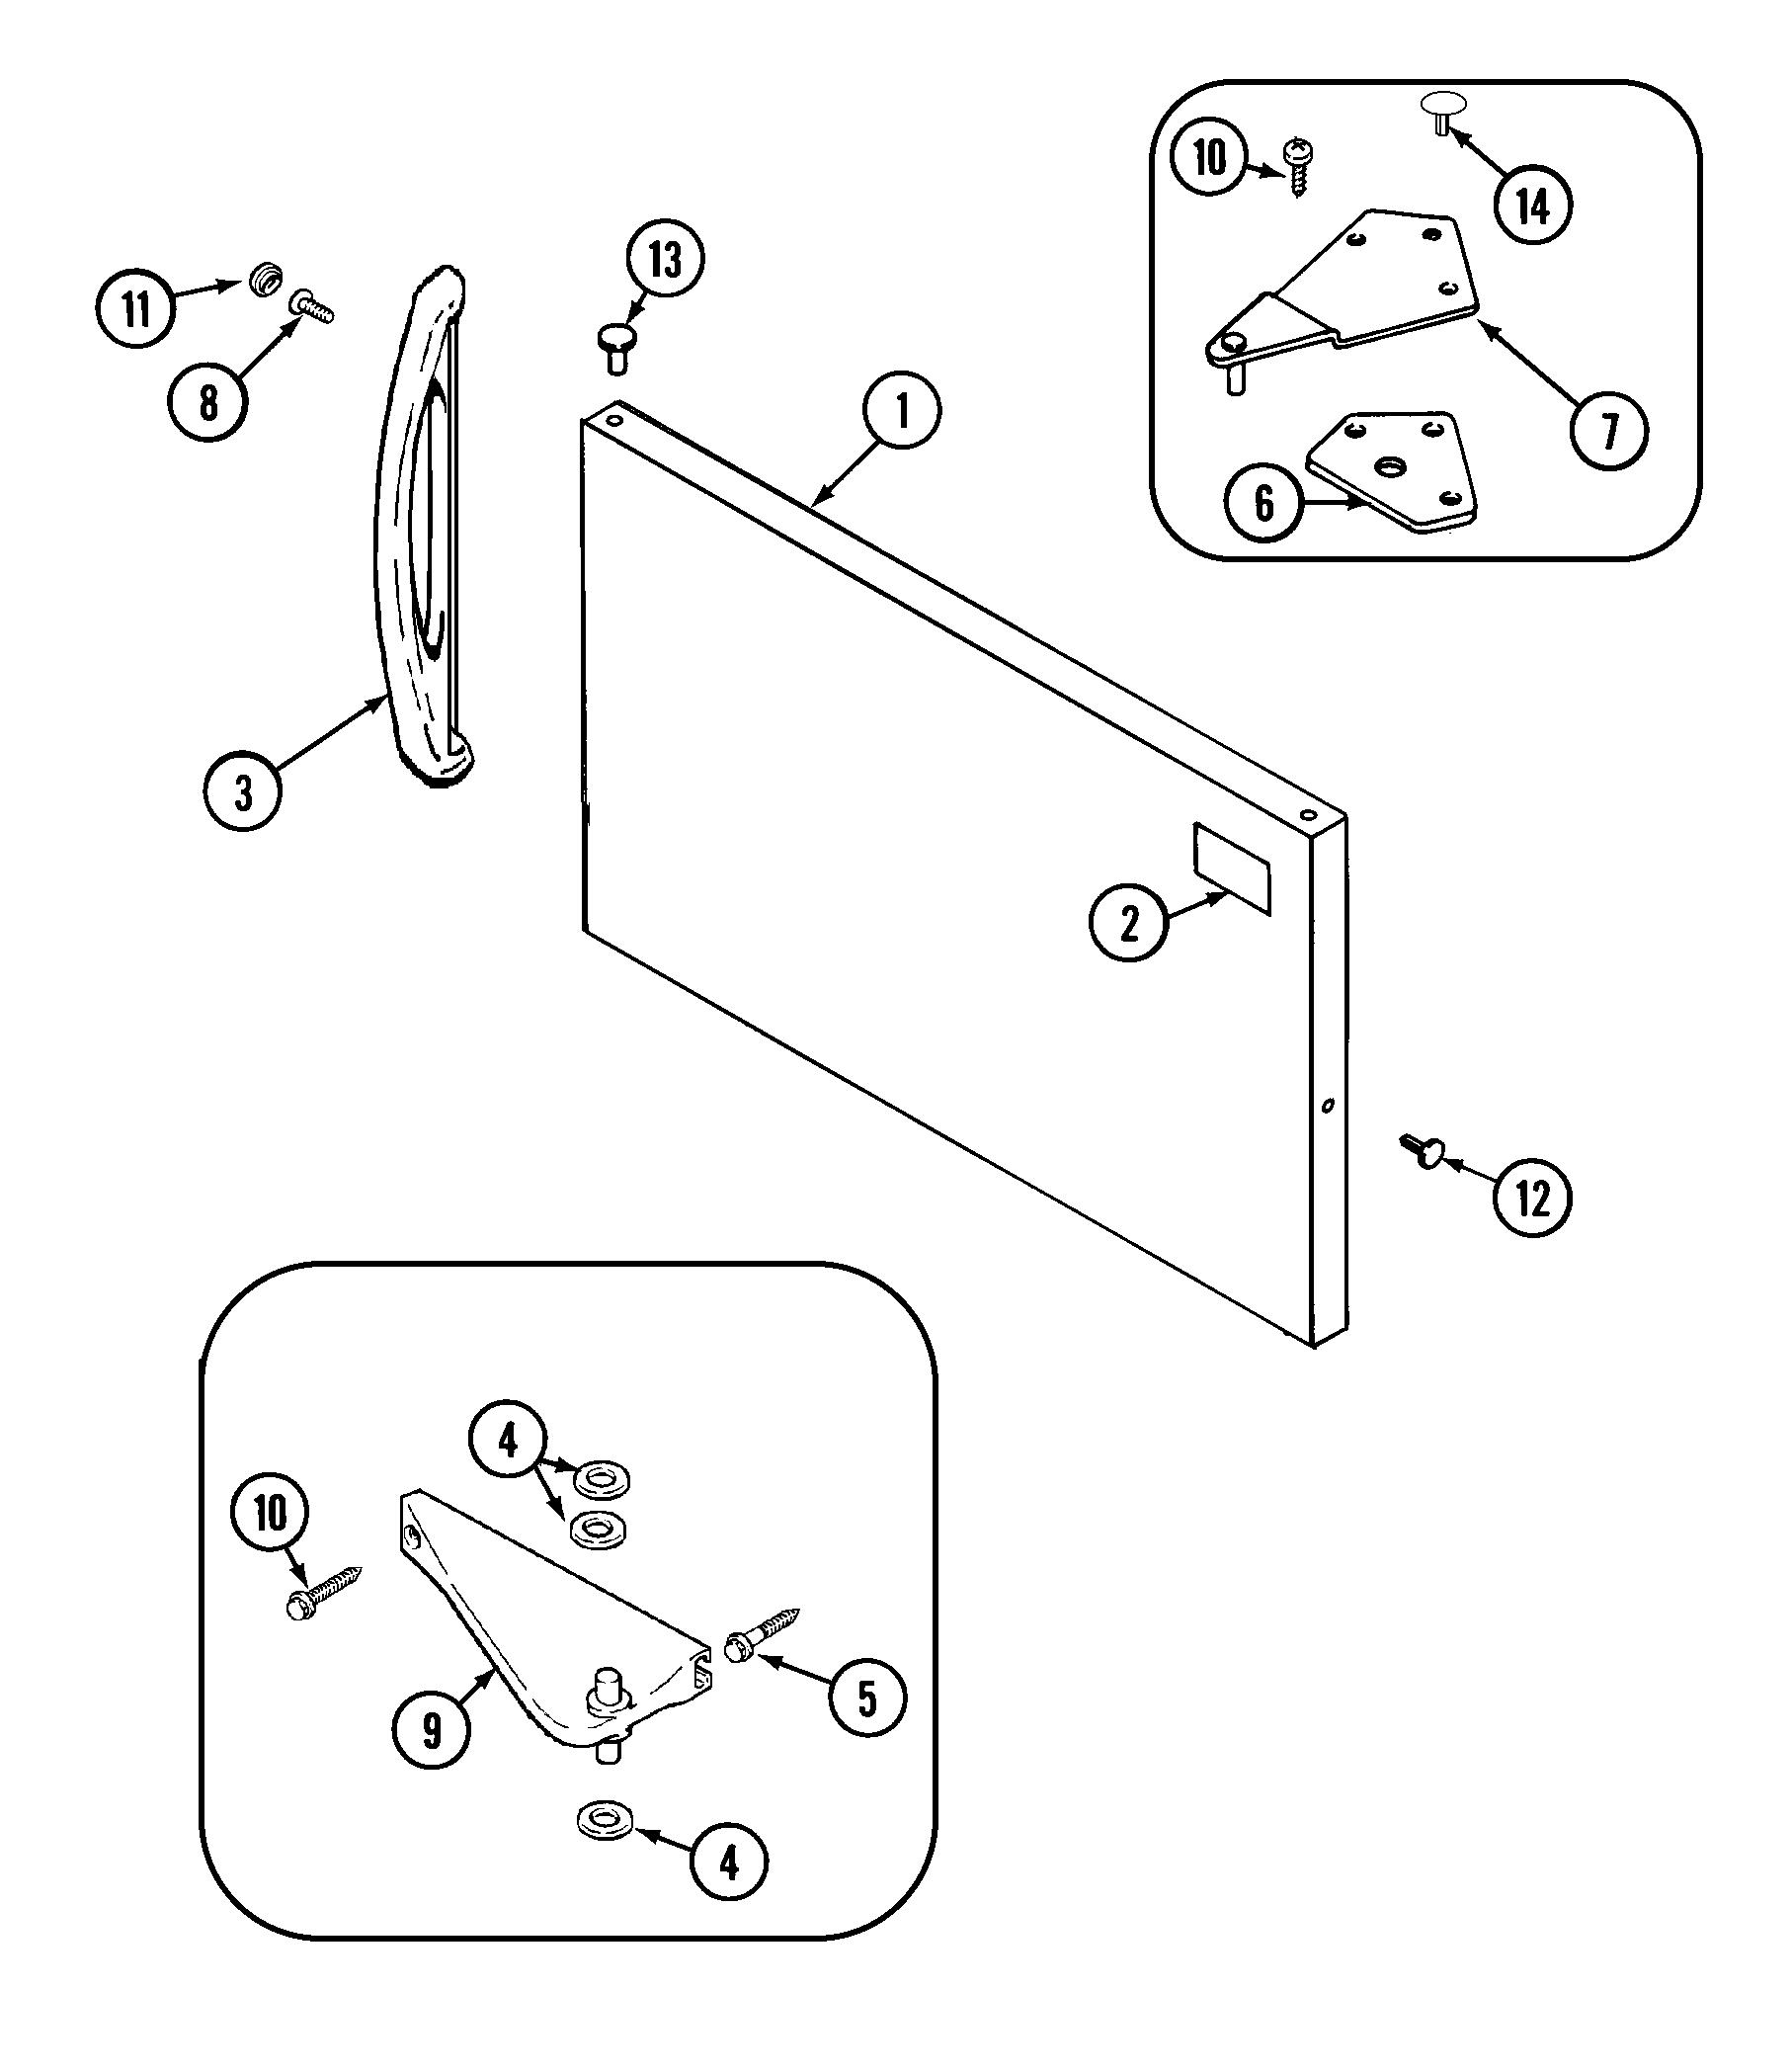 MAGIC CHEF Refrigerator Optional ice maker kit-uk